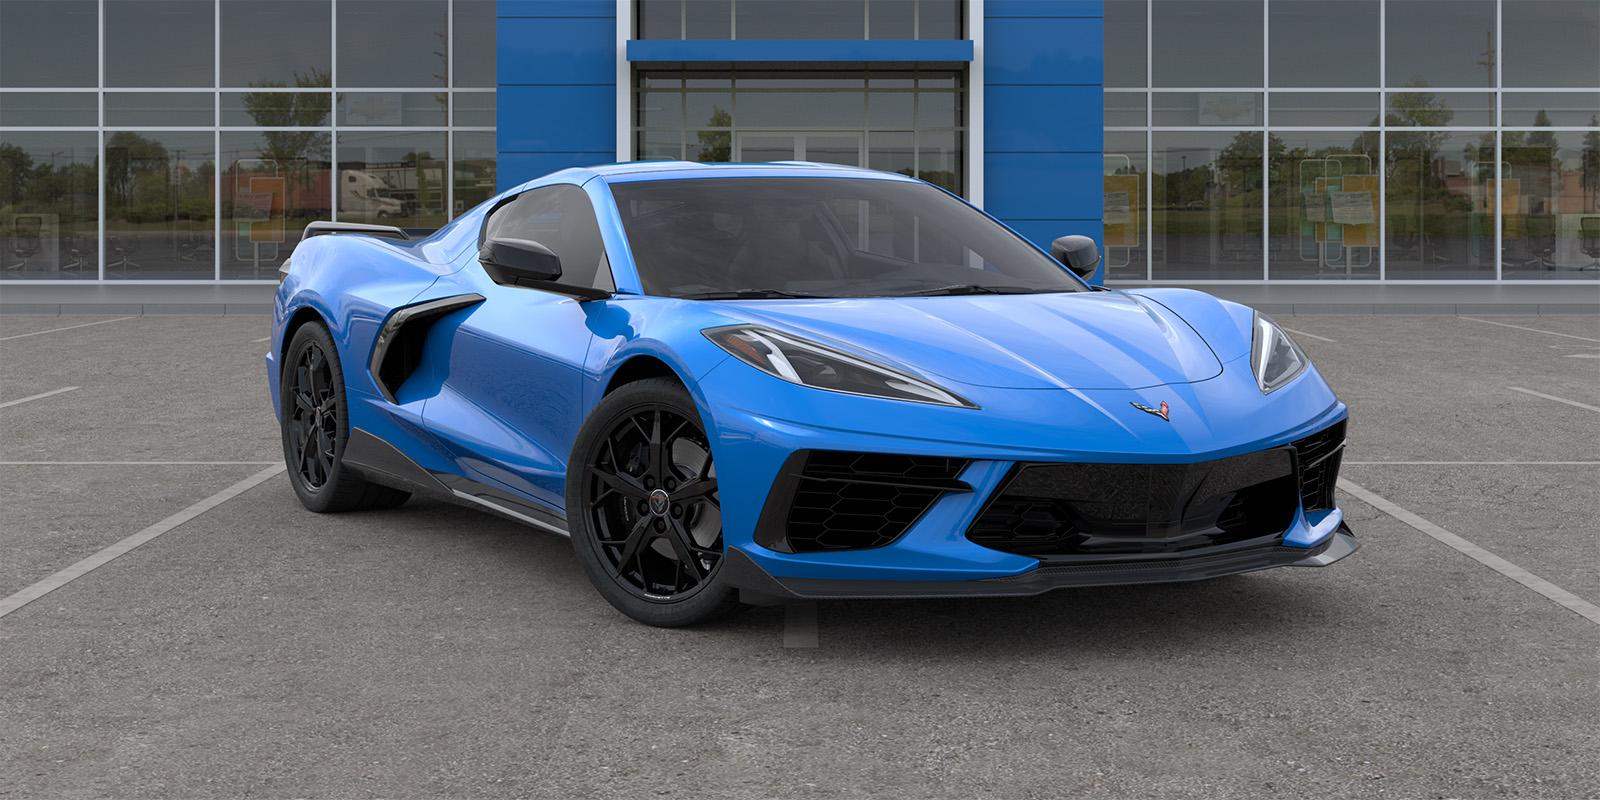 2020_Corvette_4_1600x900